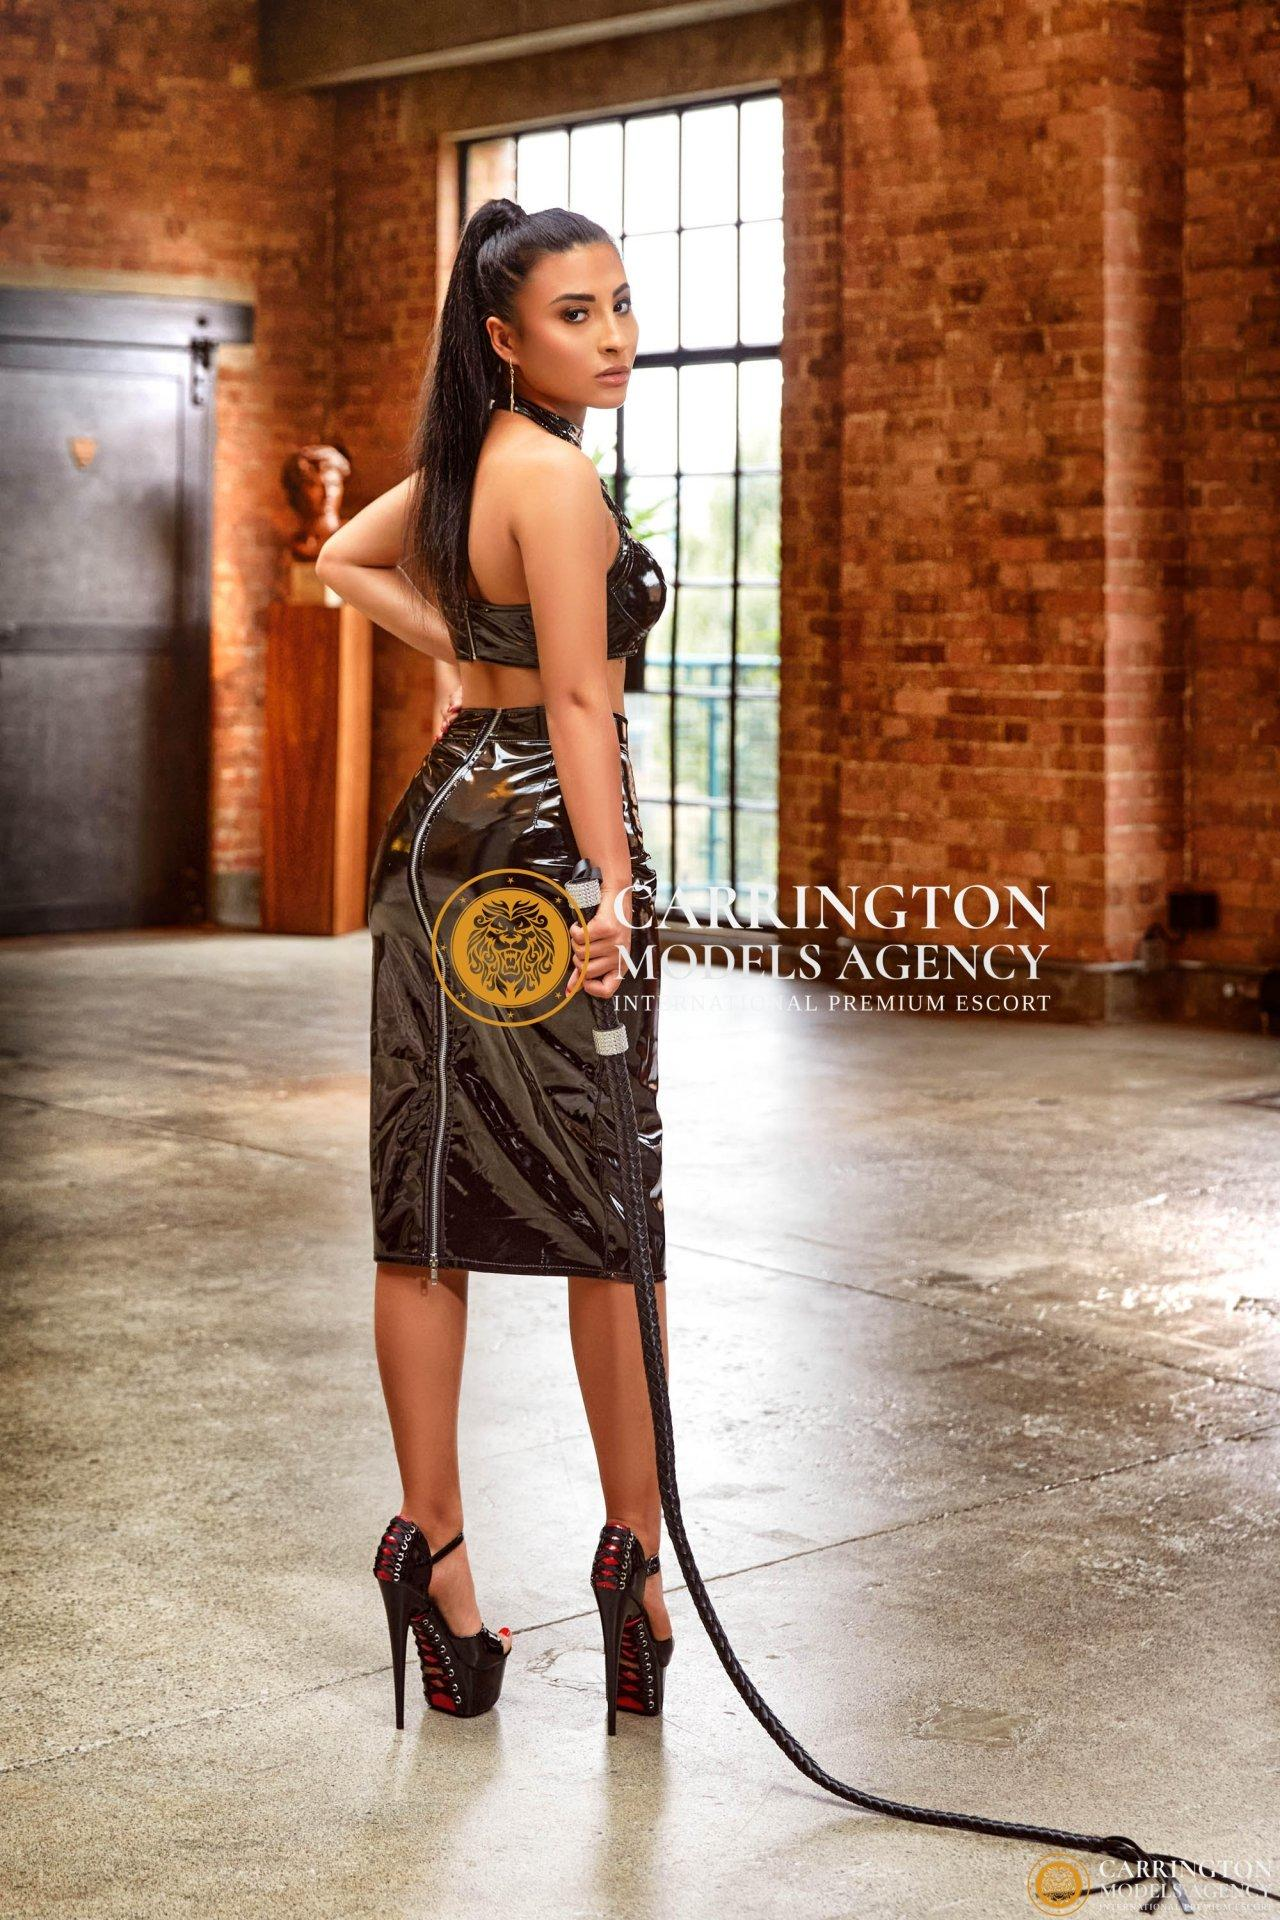 Amaya from Carrington Models